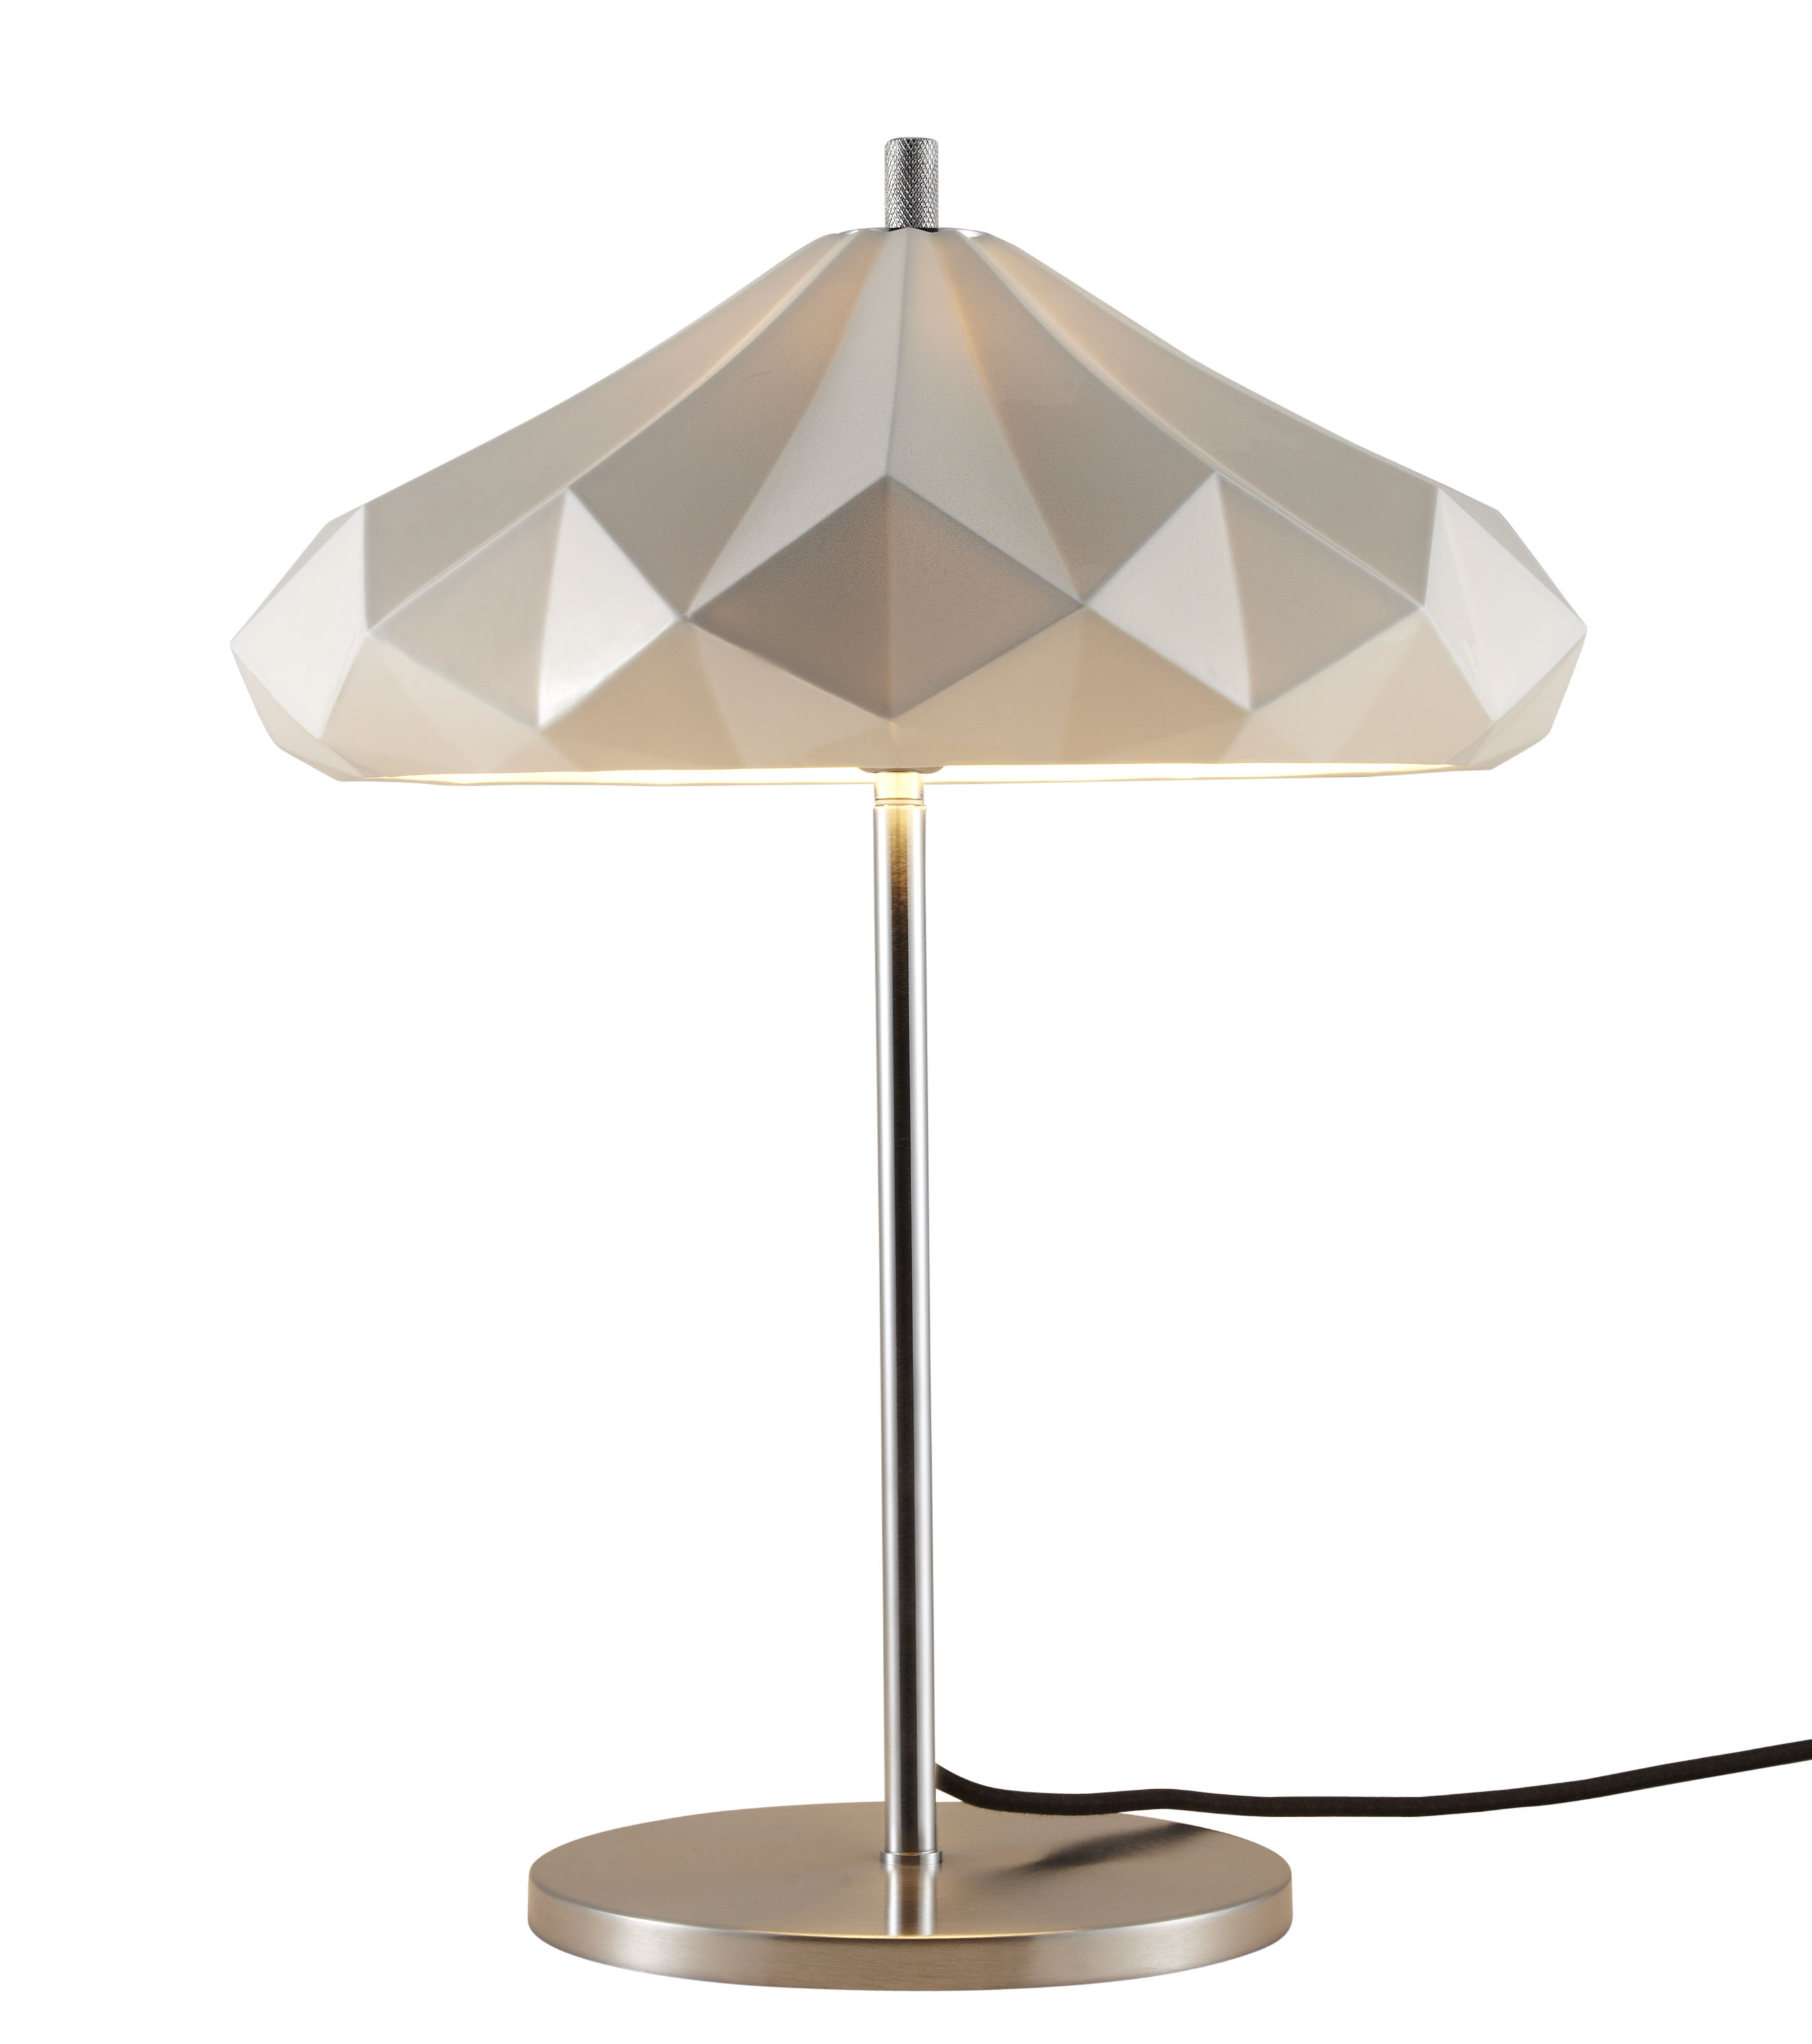 Lighting - Table Lamps - Hatton 4 Table lamp - H 54 cm - Bone China by Original BTC - White / Chromed leg - China, Chromed metal